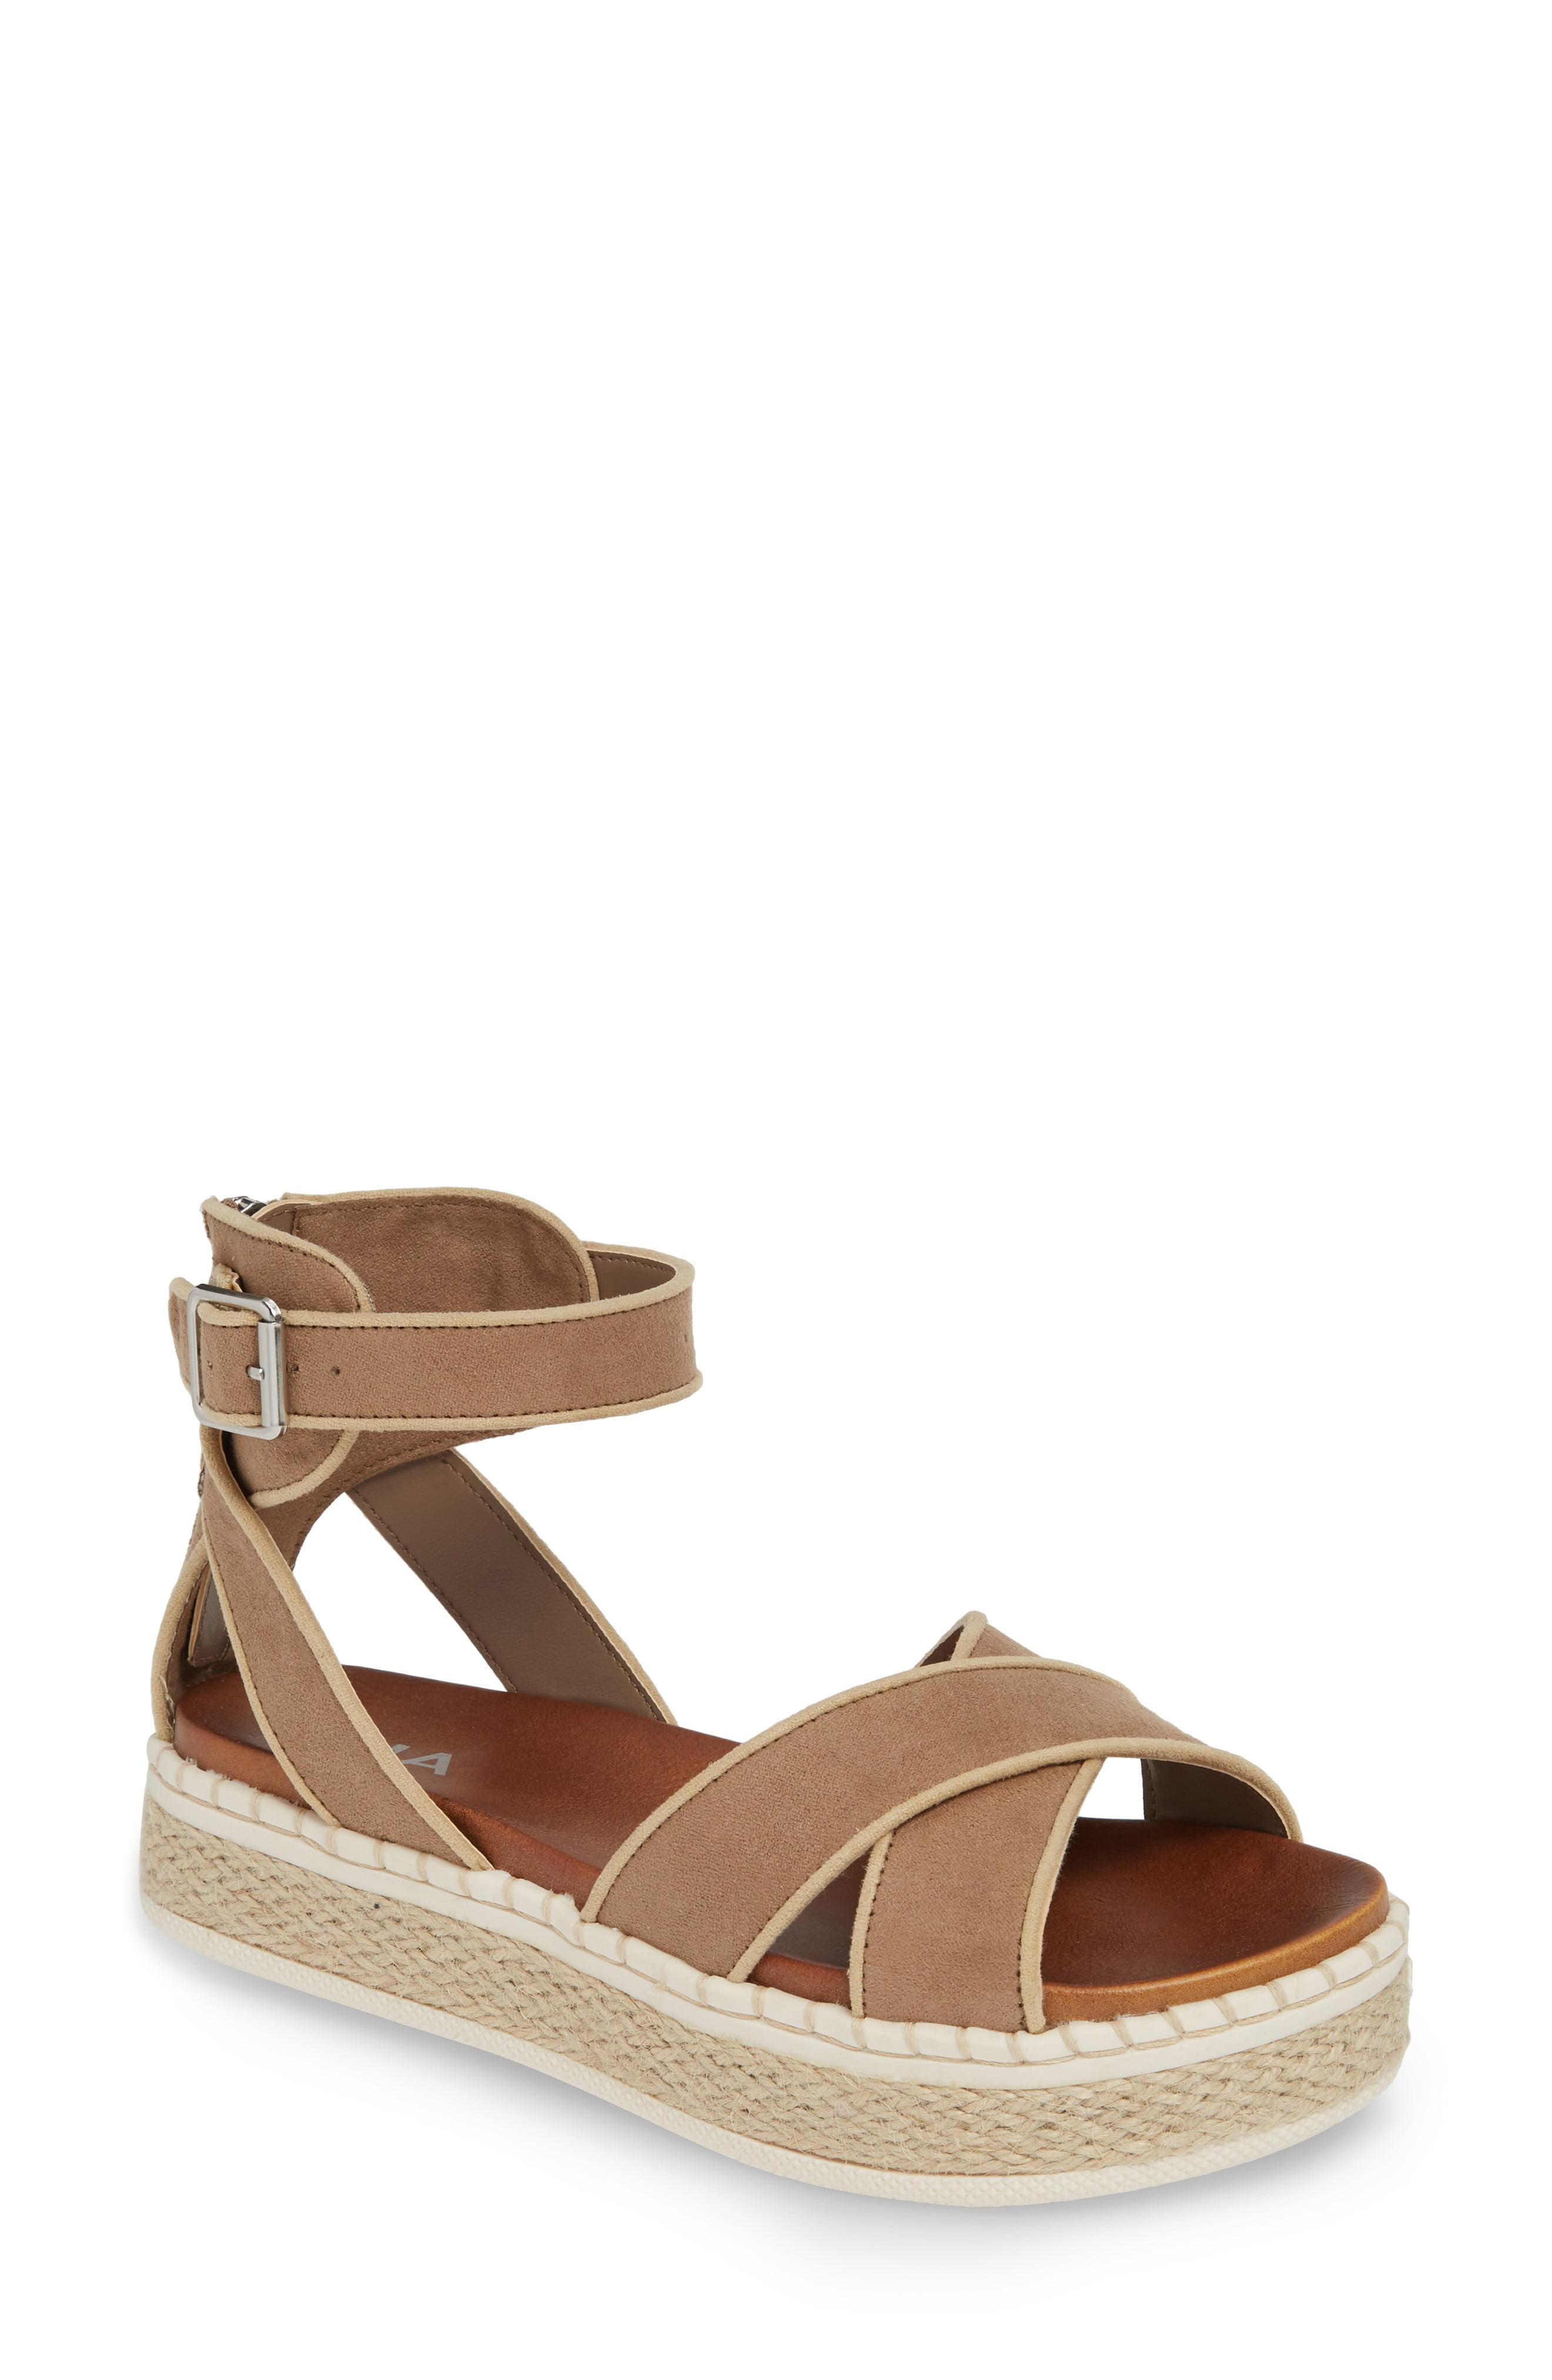 9e84cdd6f21 Lyst - MIA Vita Espadrille Platform Sandal in Brown